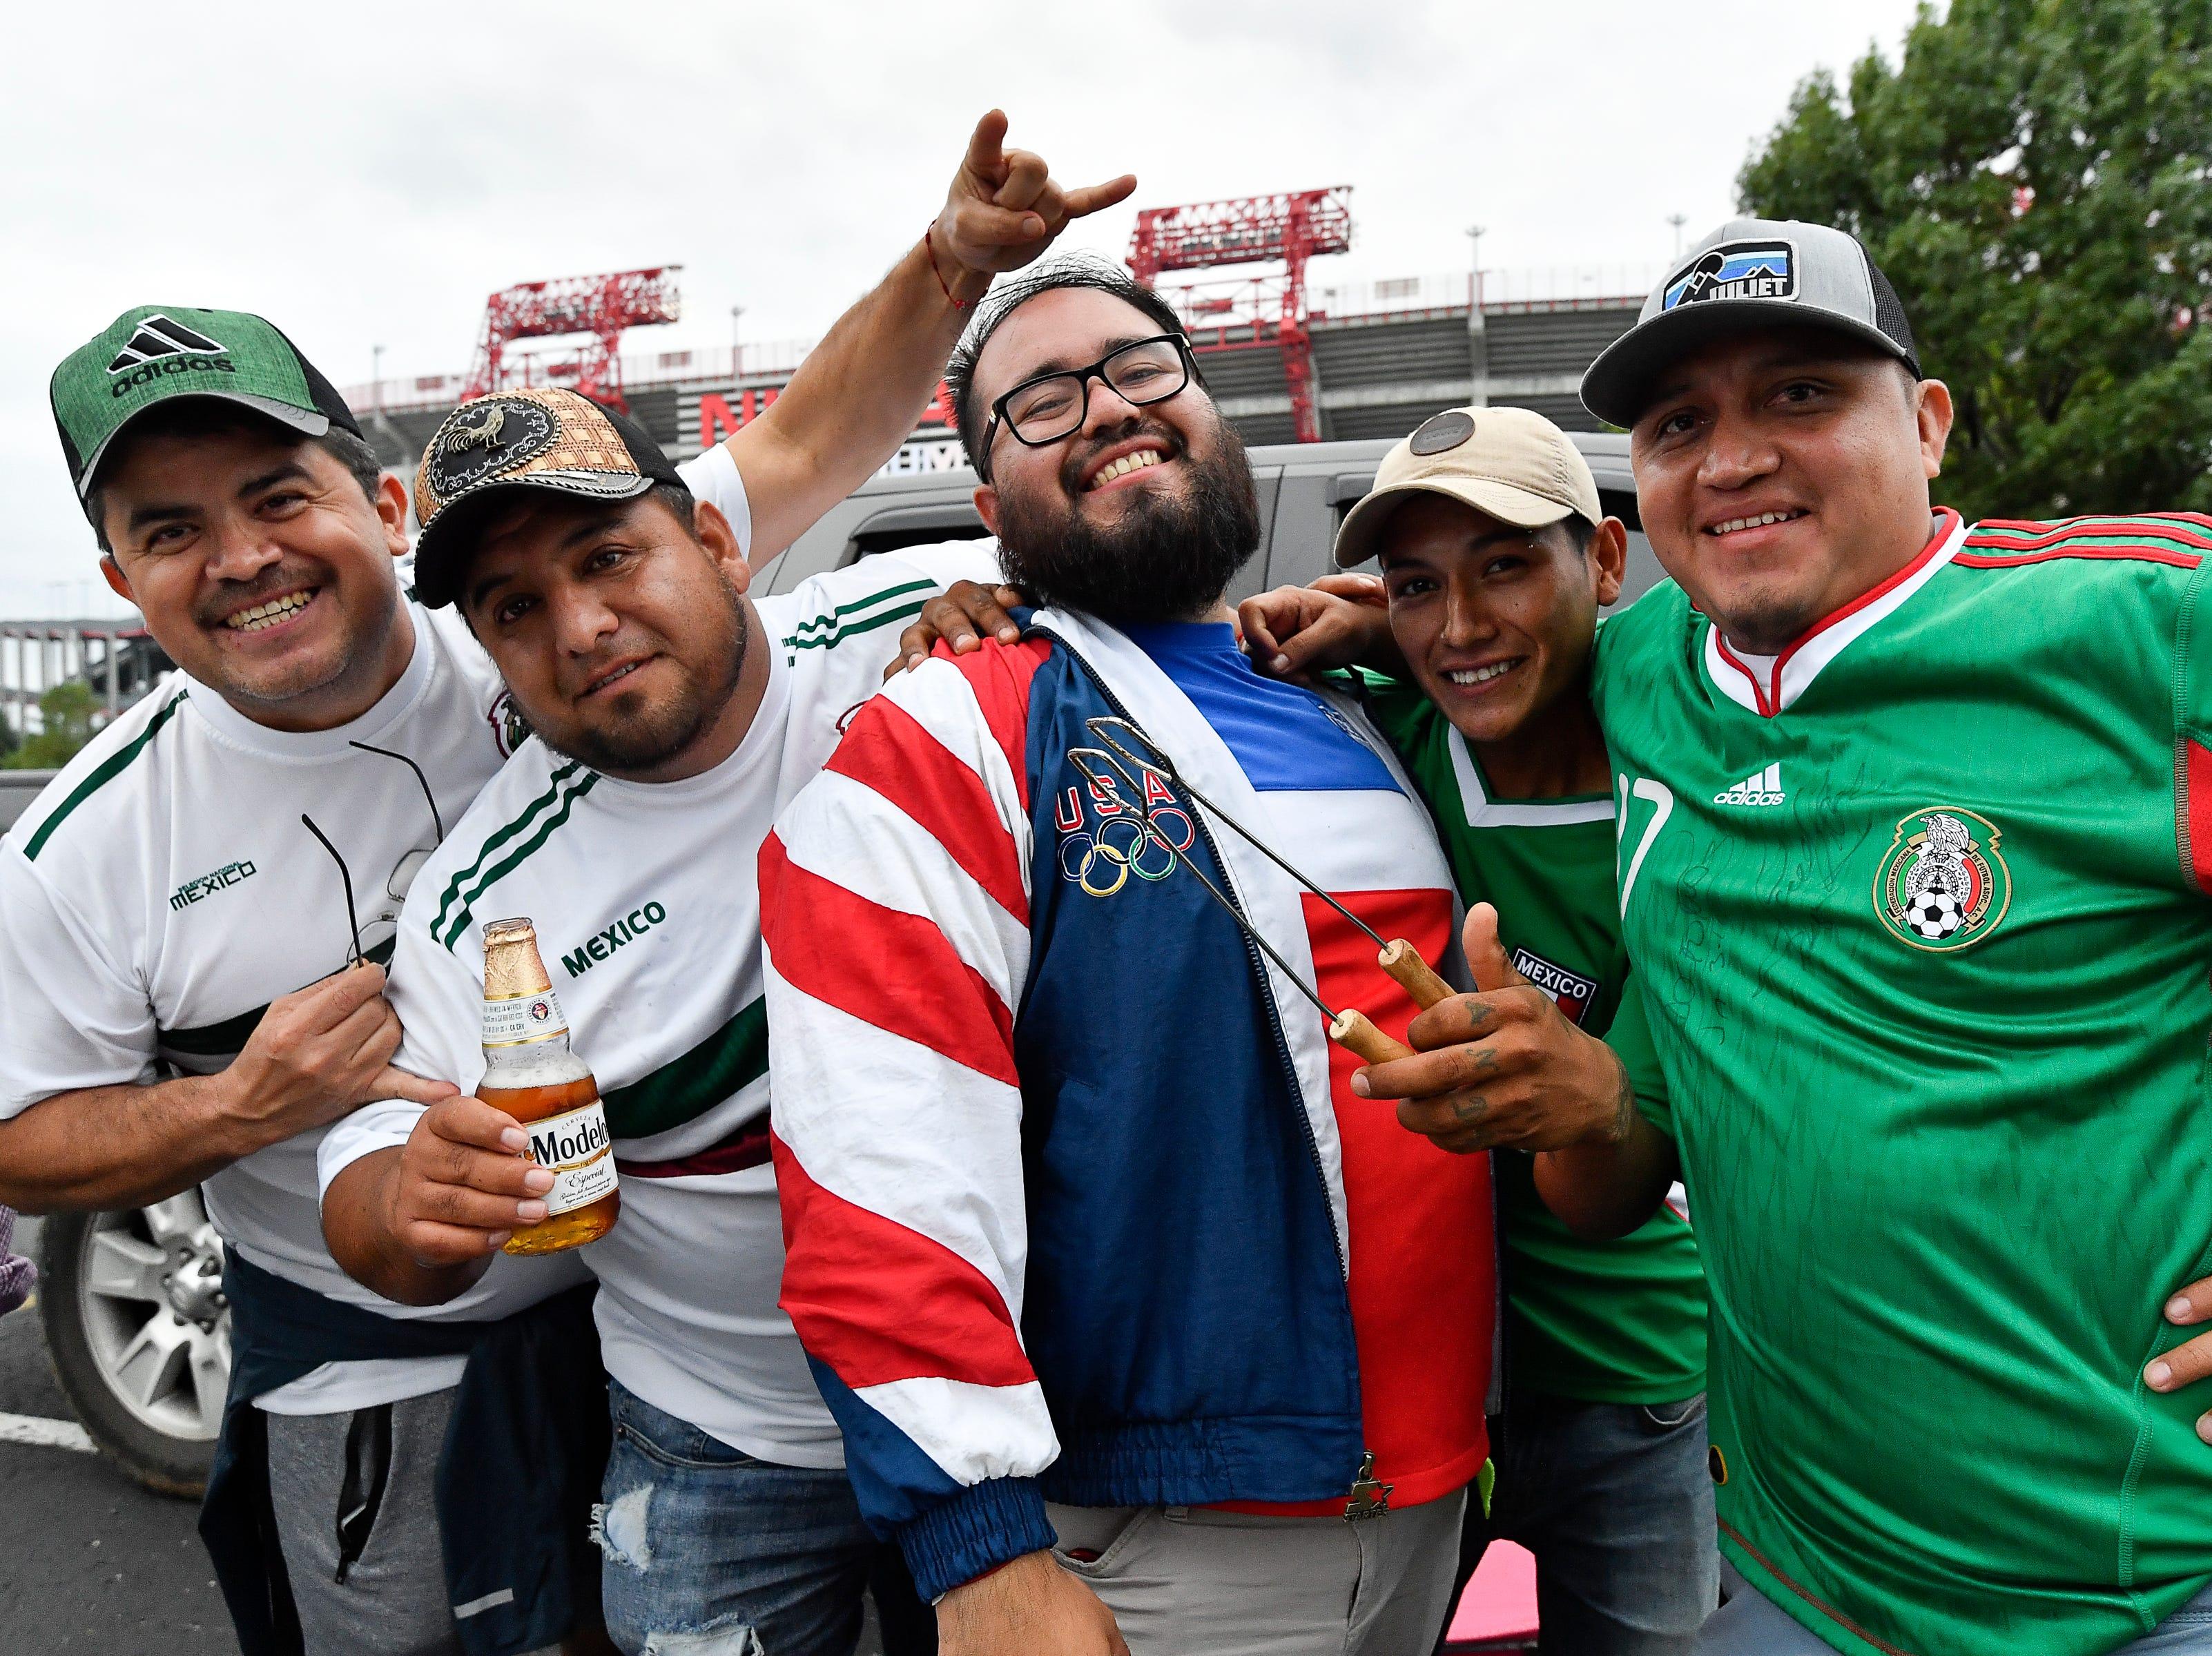 Soccer fans Jose Calderon, Jose Sanchez, Dante Martinez, Jesus Vargas and Christian Jimenez get ready for the USA vs. Mexico soccer match at Nissan Stadium Tuesday, Sept. 11, 2018, in Nashville, Tenn.